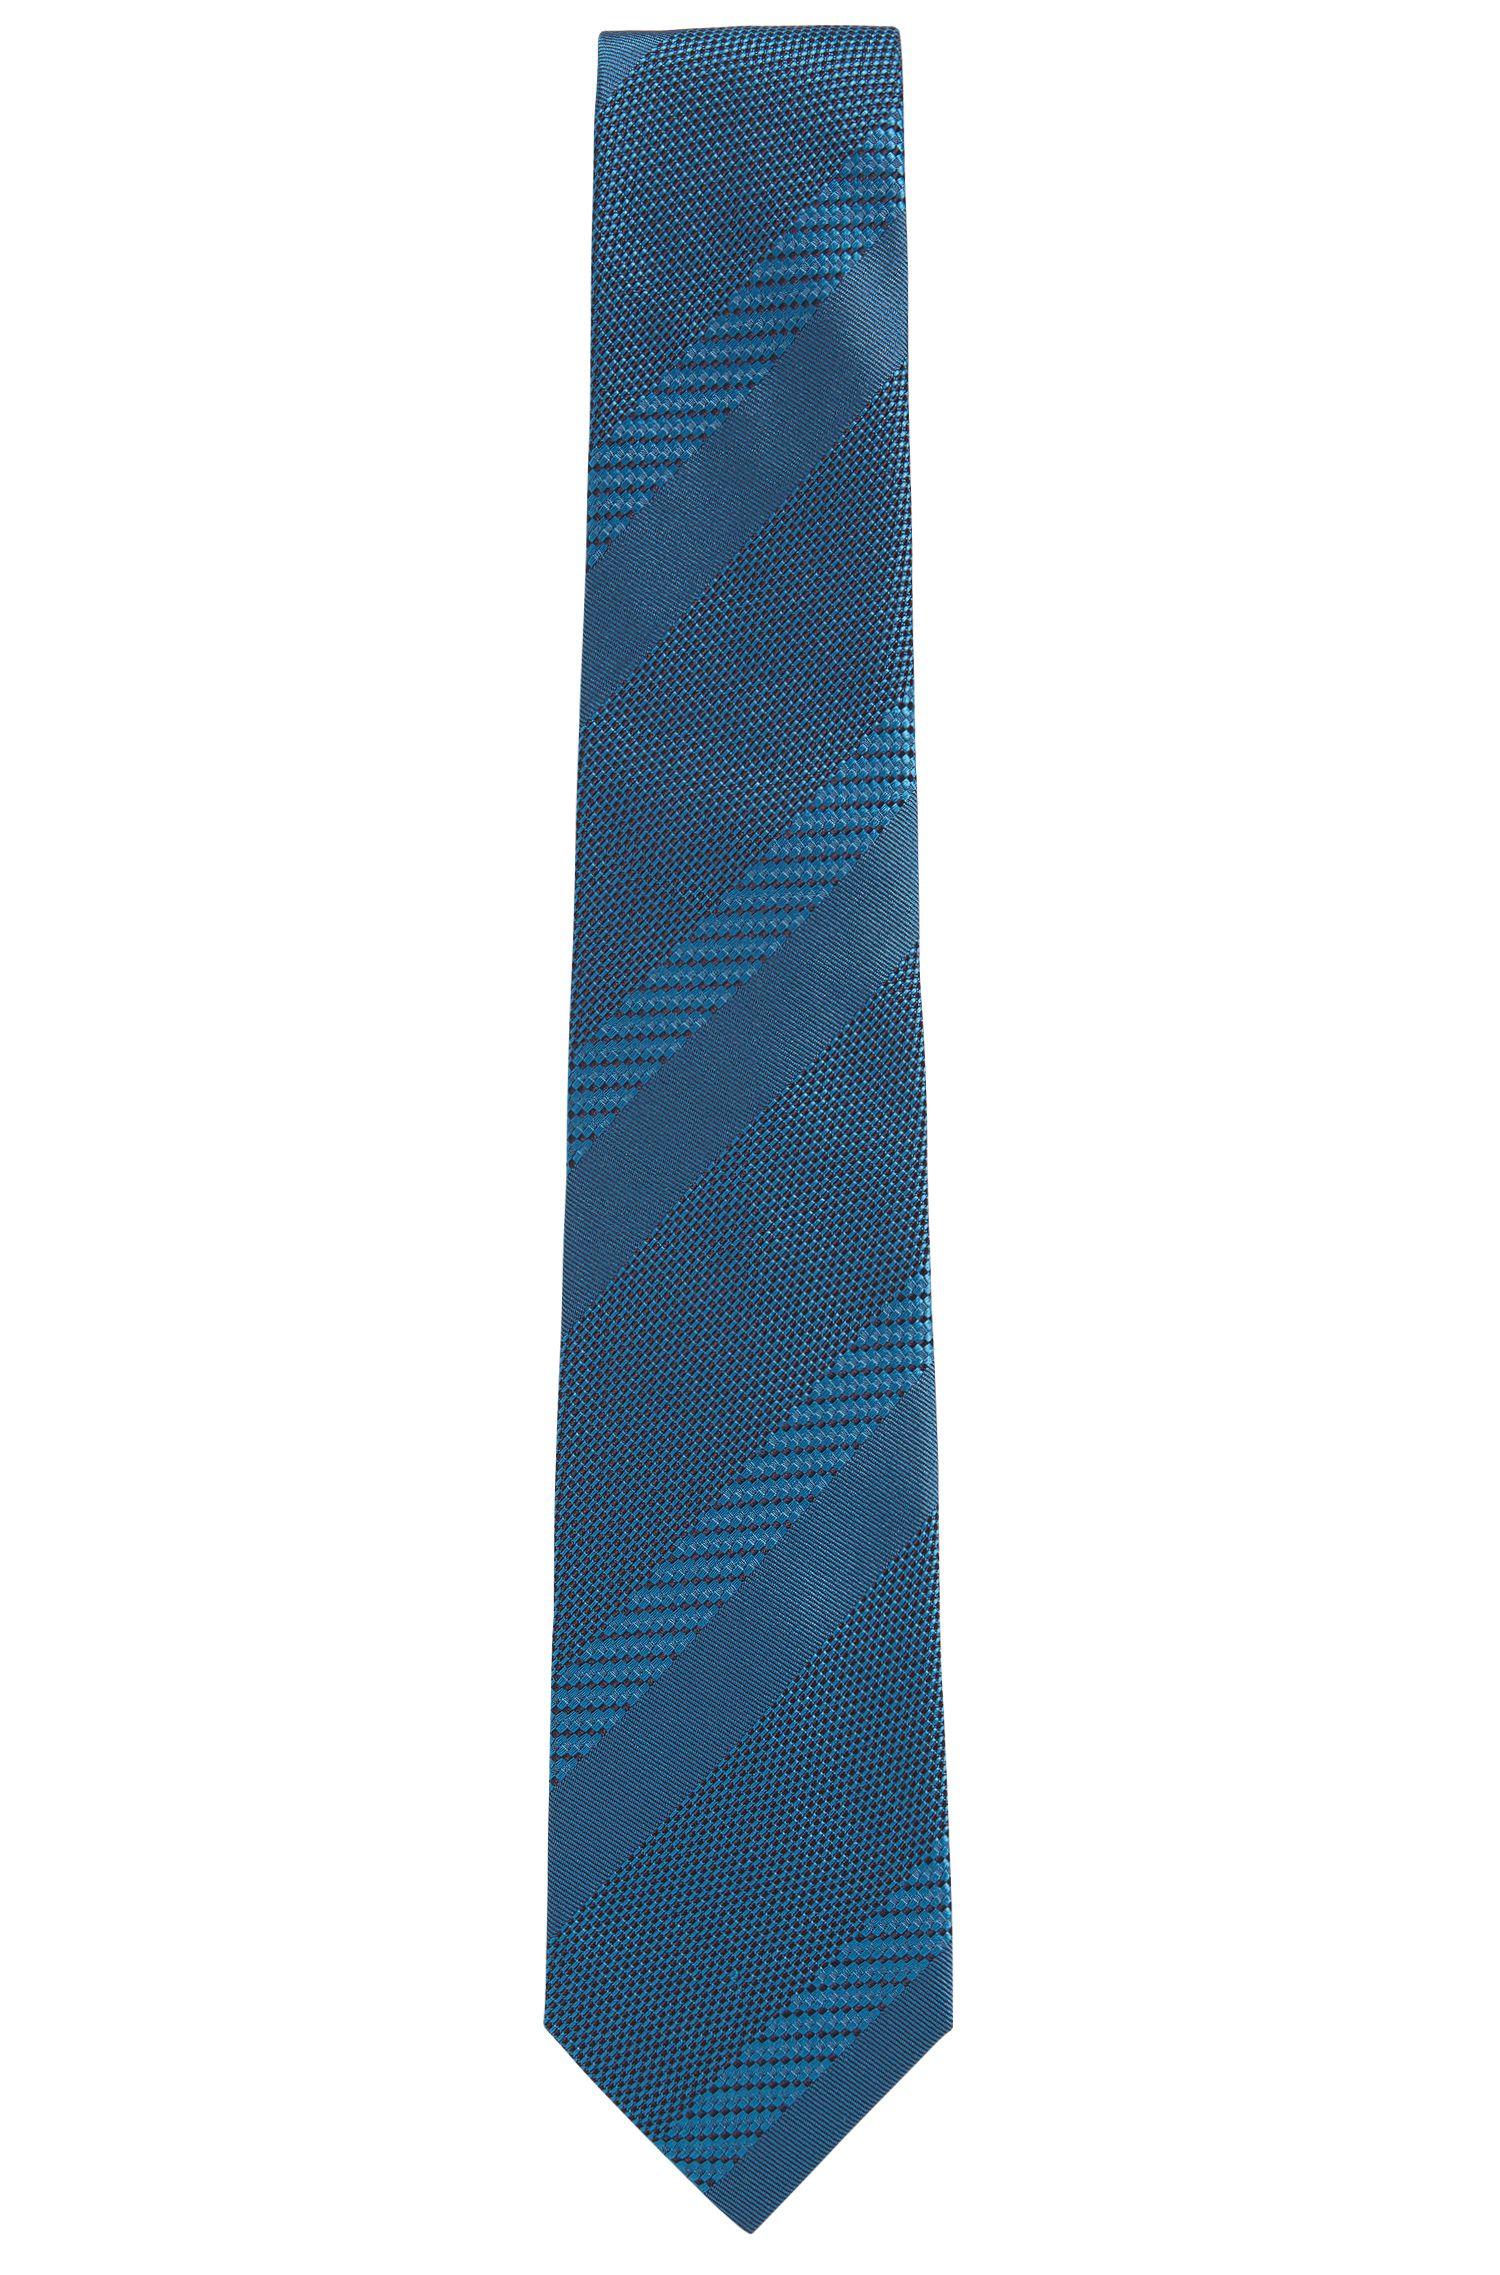 'T-Tie 7.5 cm' | Regular, Basketweave Stripe Italian Silk Tie